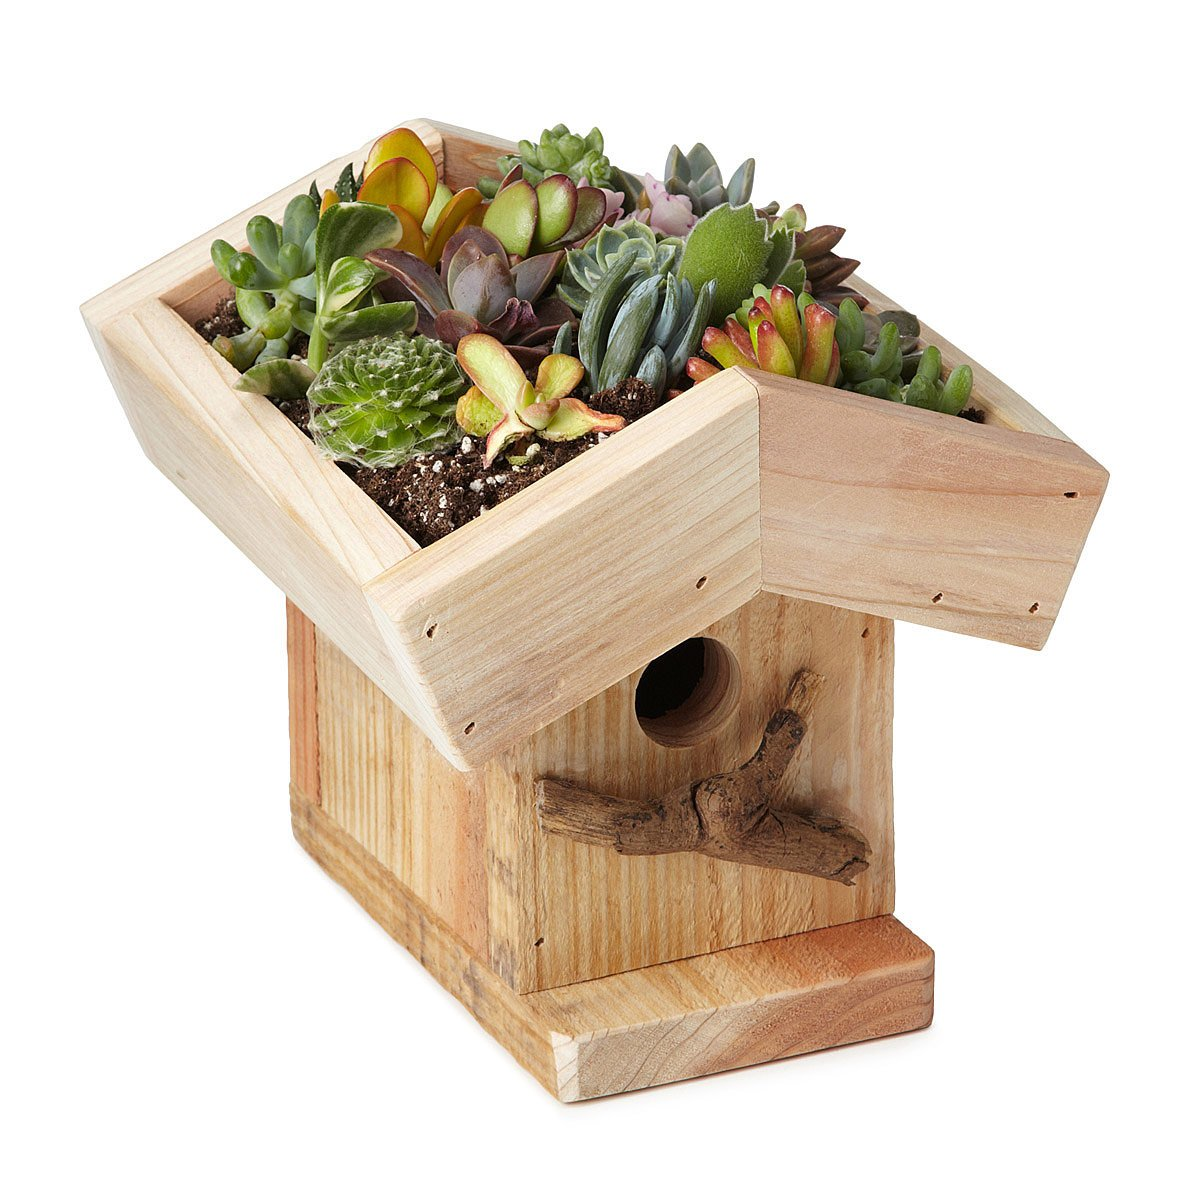 Birdhouse Living Roof Birdhouse Kit Living Roof Bird House Uncommongoods